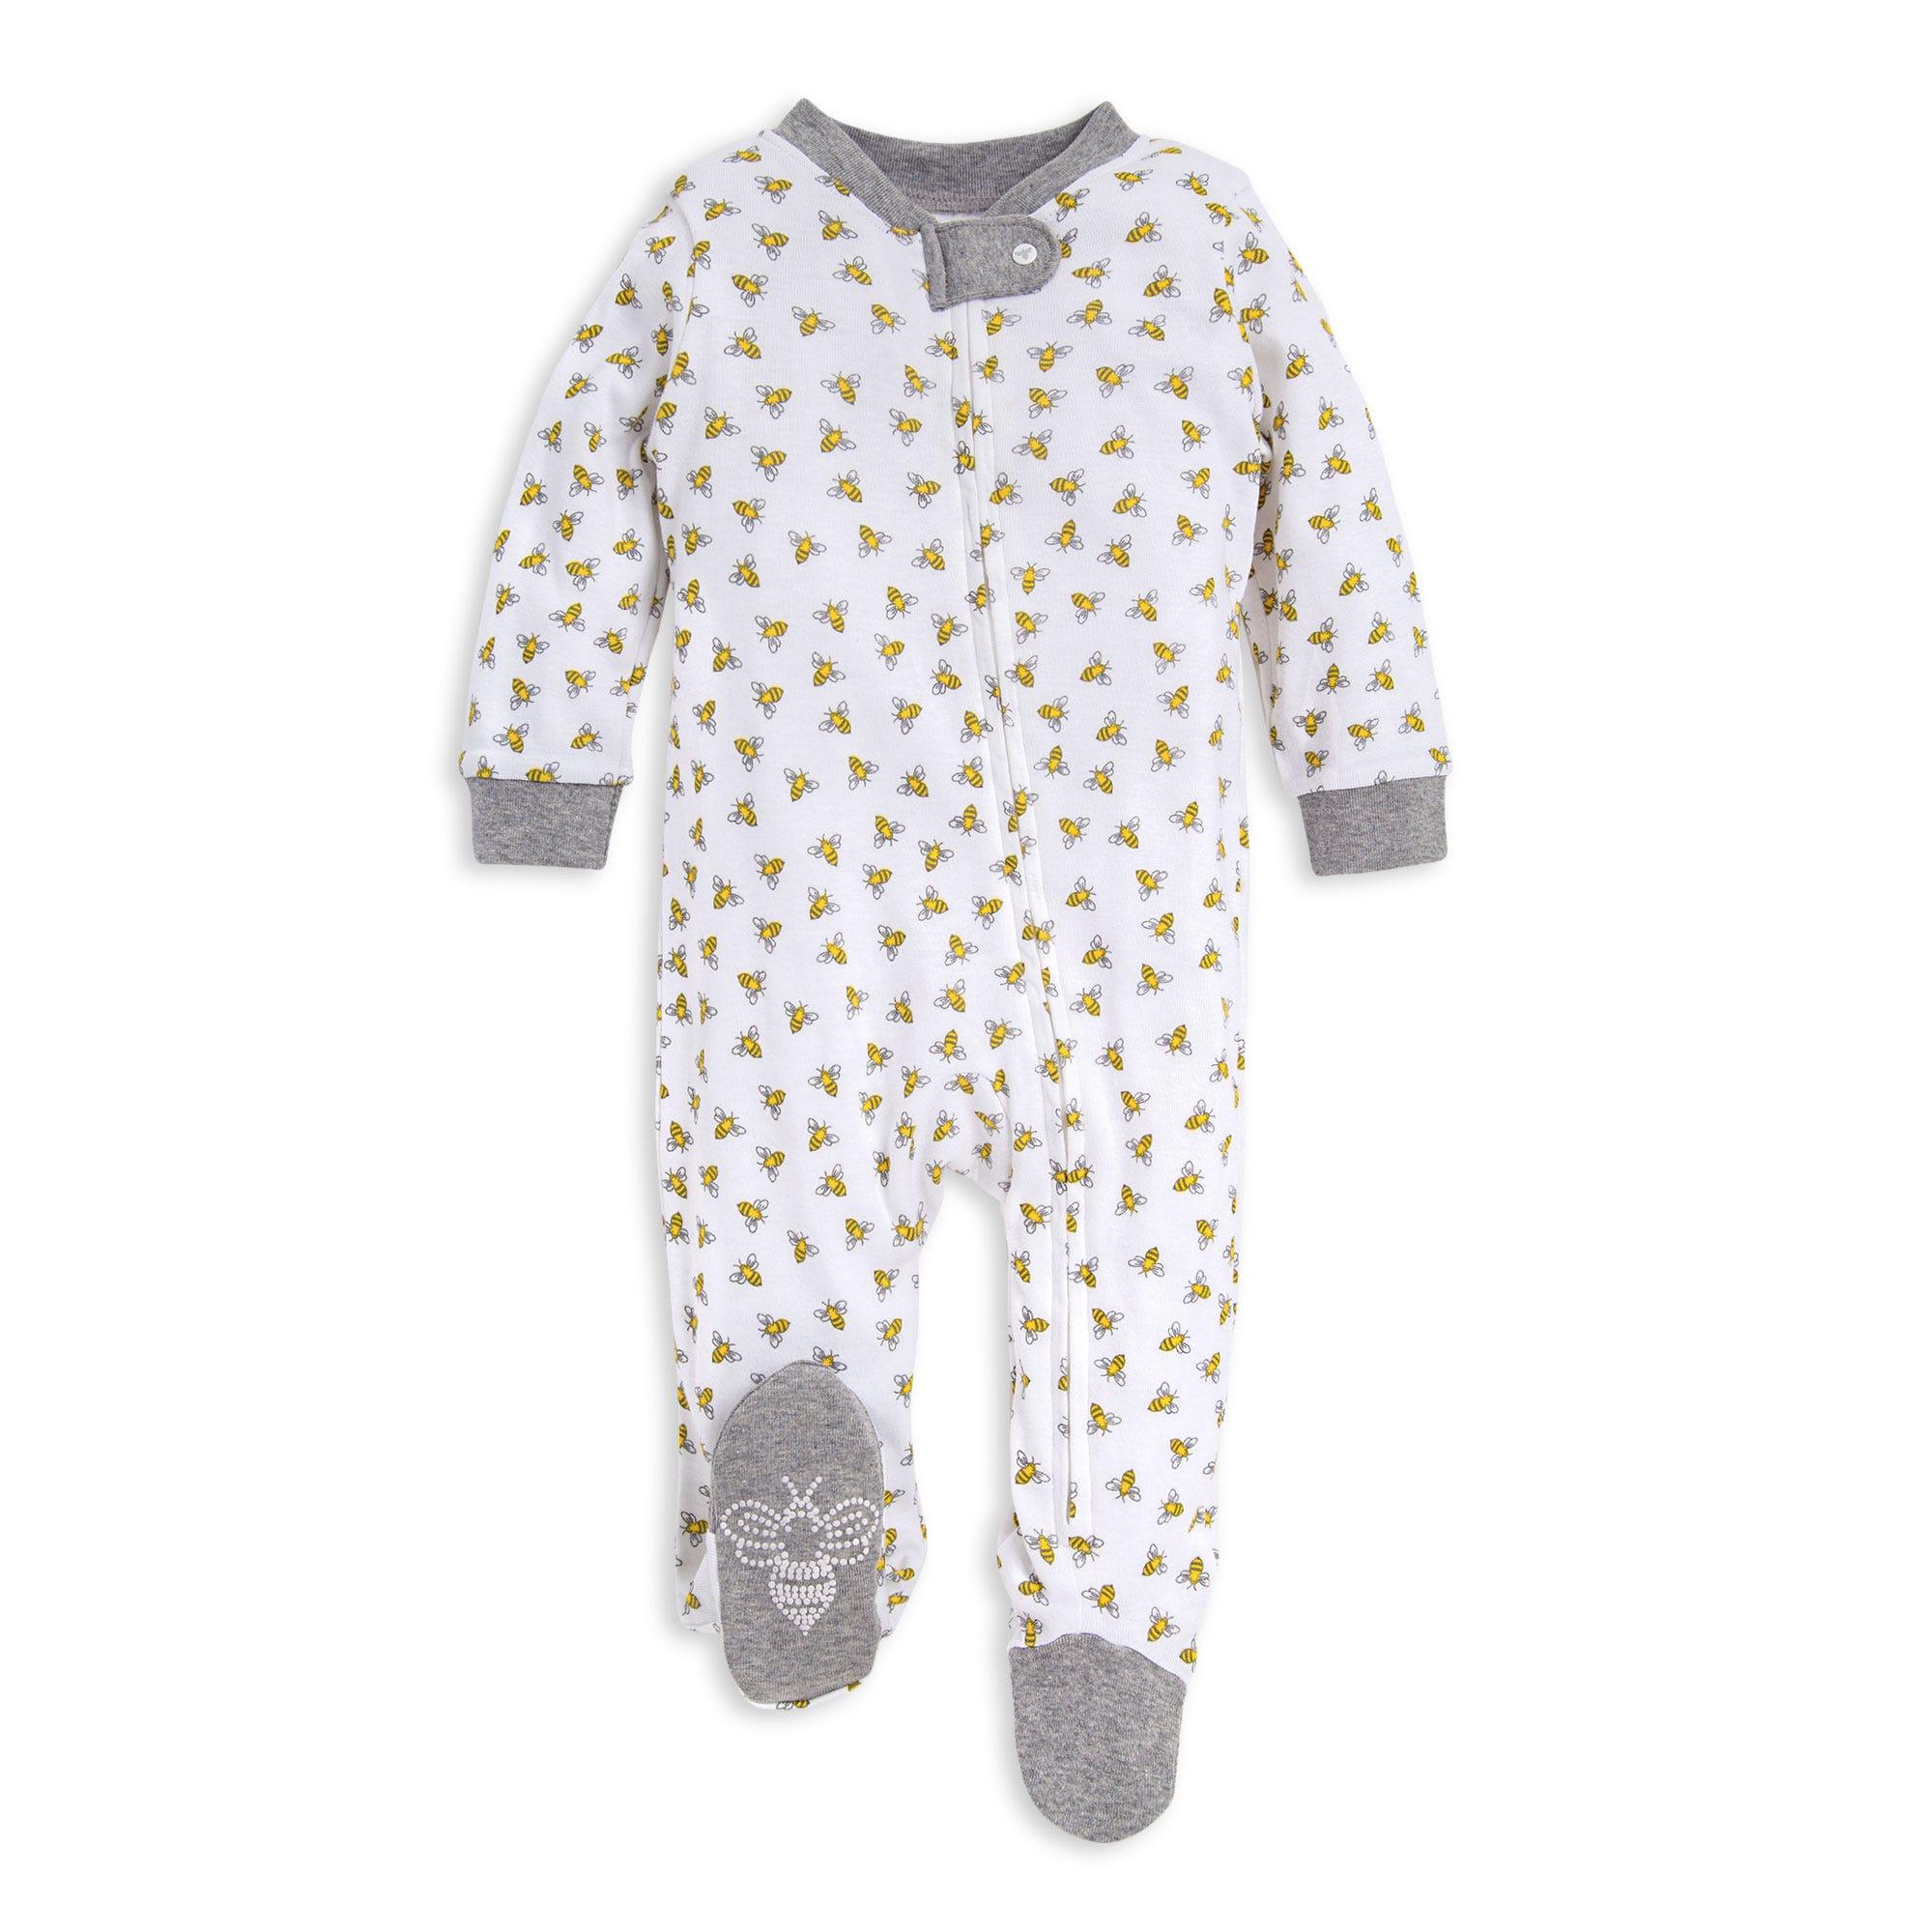 HonestBaby Baby Organic Cotton Snug-fit Footed Pajamas